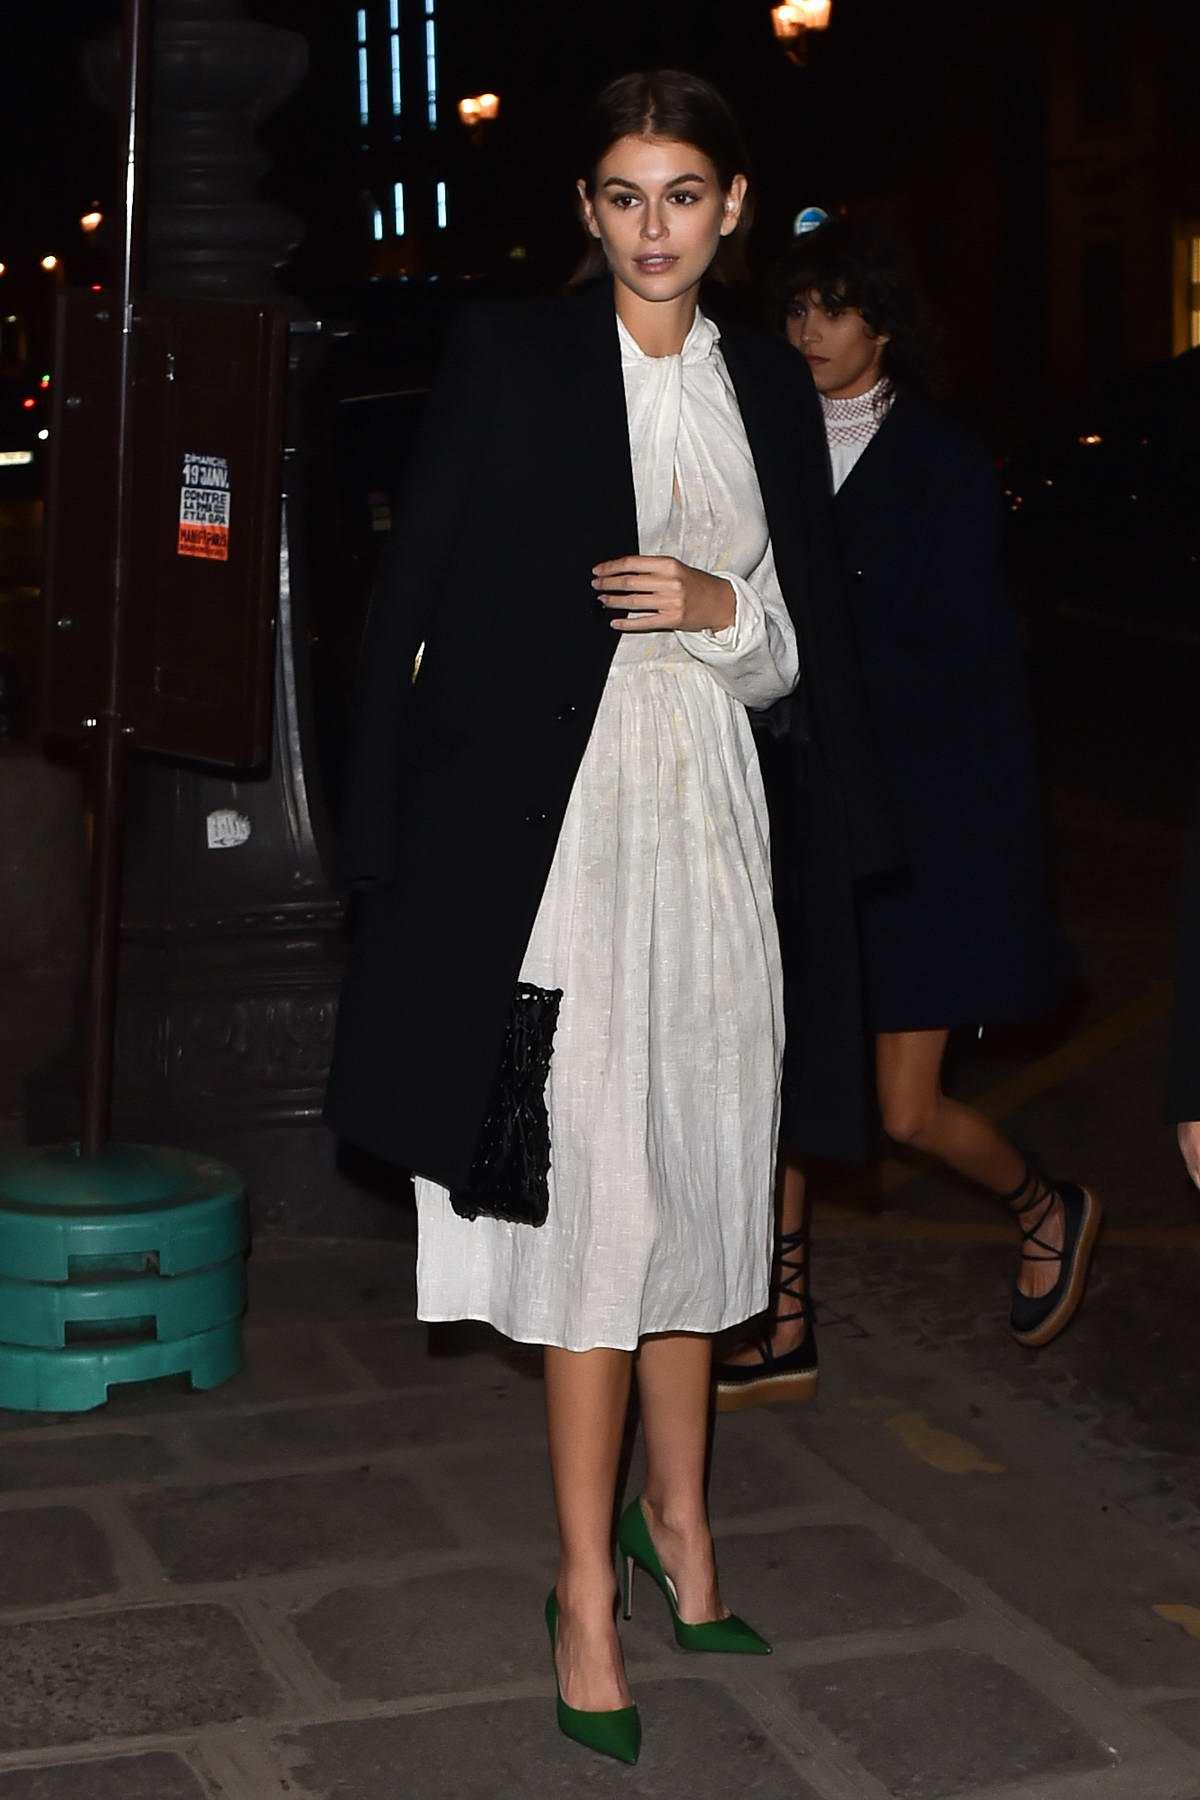 Kaia Gerber arrives at the Prada dinner party in Paris, France